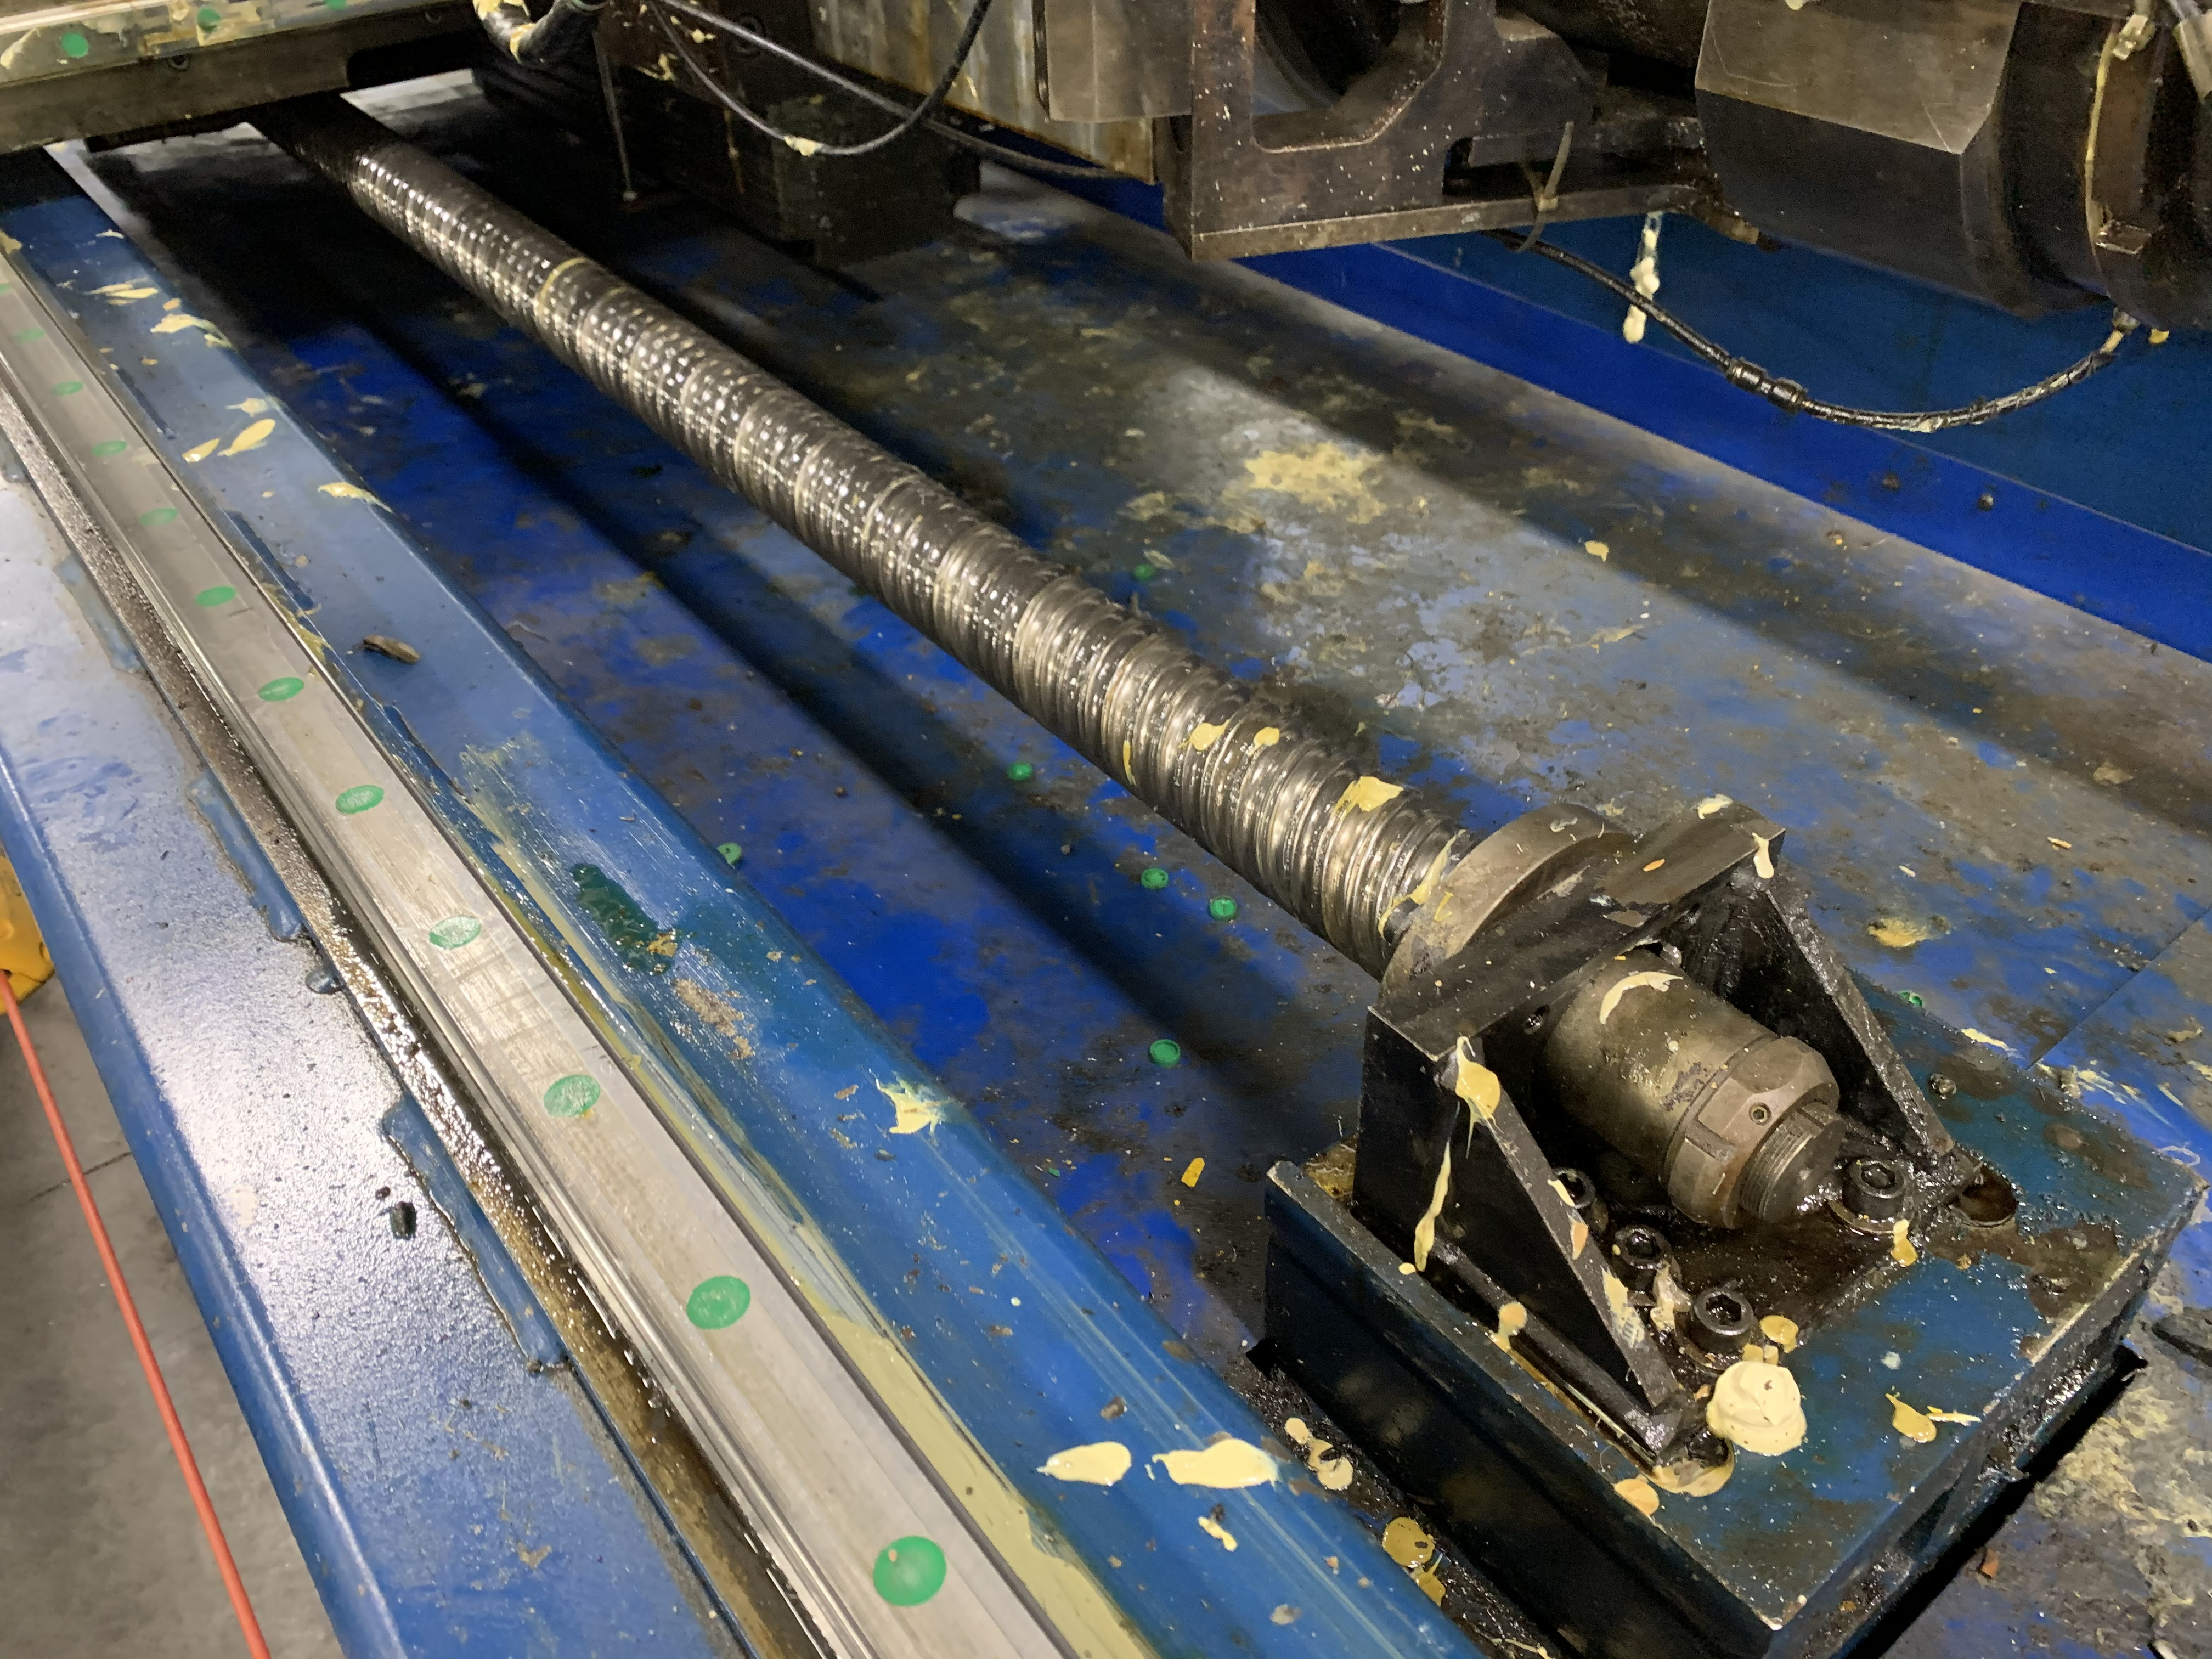 "6"" UNISON MODEL 6"" MS RH ELECTRIC CNC MULTI-STACK TUBE BENDER; S/N 2715, JOB NO. ME 4-410,(NEW 2014) - Image 16 of 72"